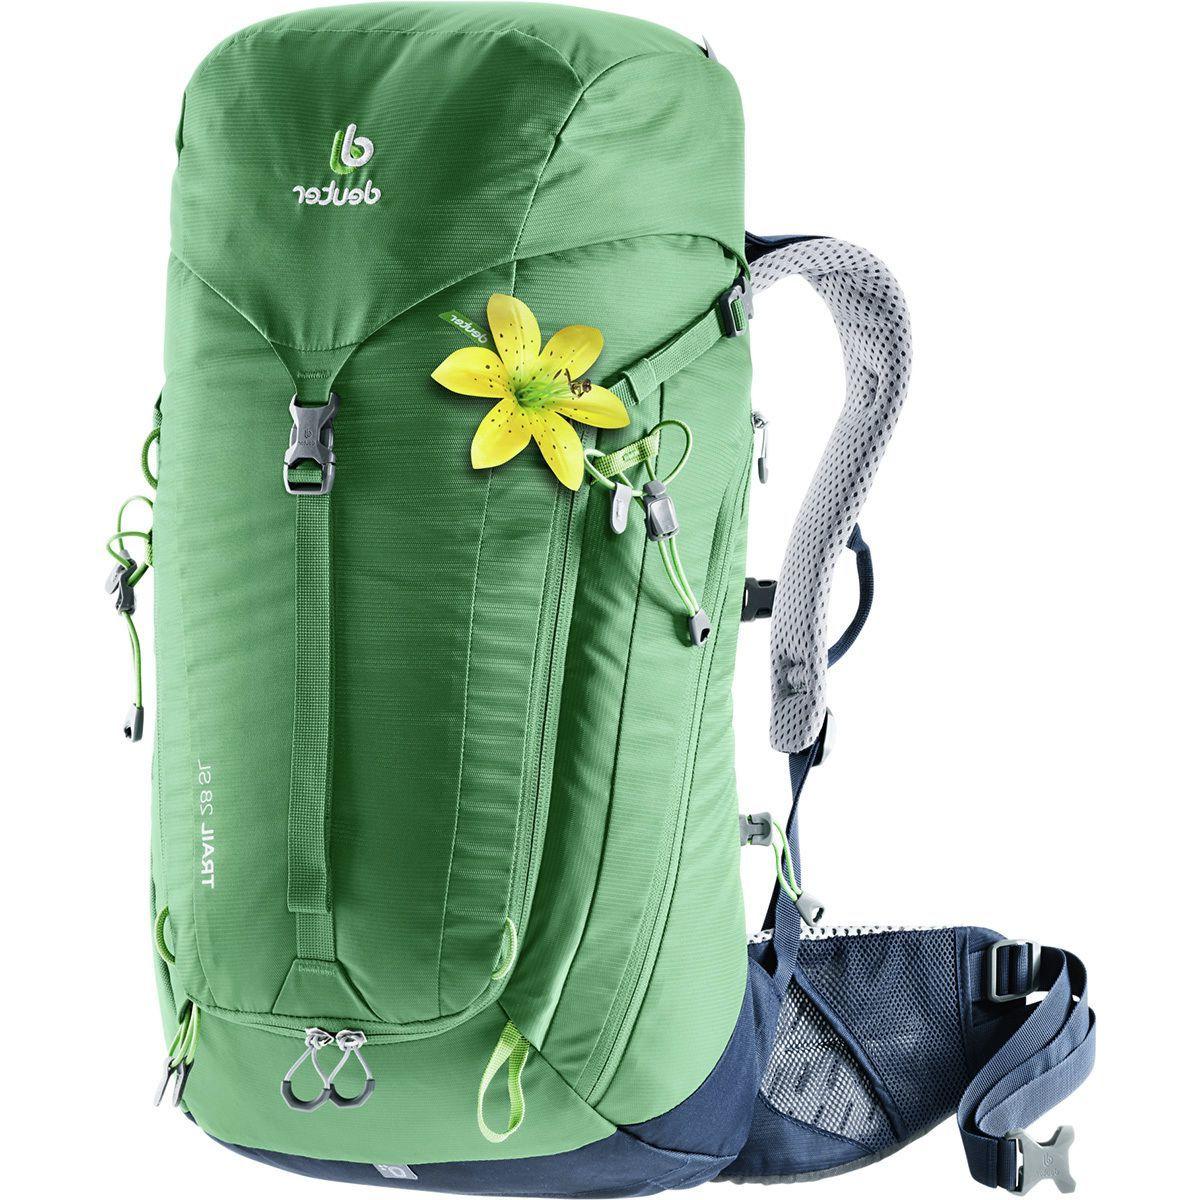 Deuter Trail 28 SL Backpack - Women's